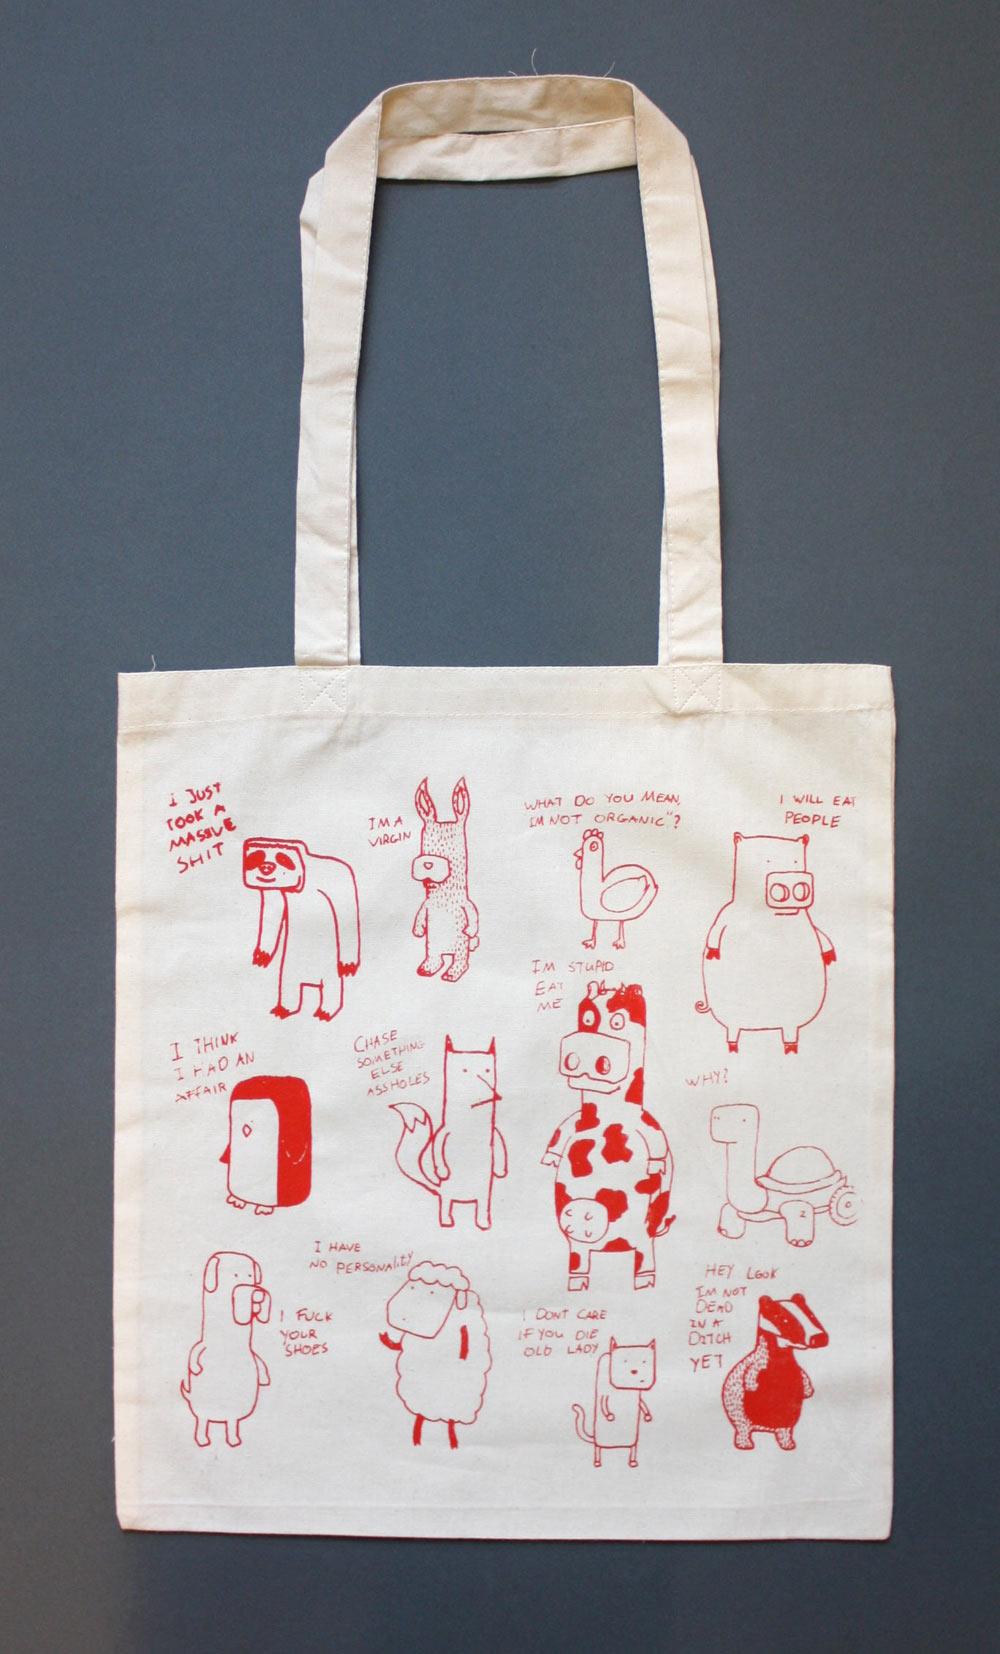 4aebedb02e Animals - Screen Printed Tote bag - Jam Art PrintsJam Art Prints